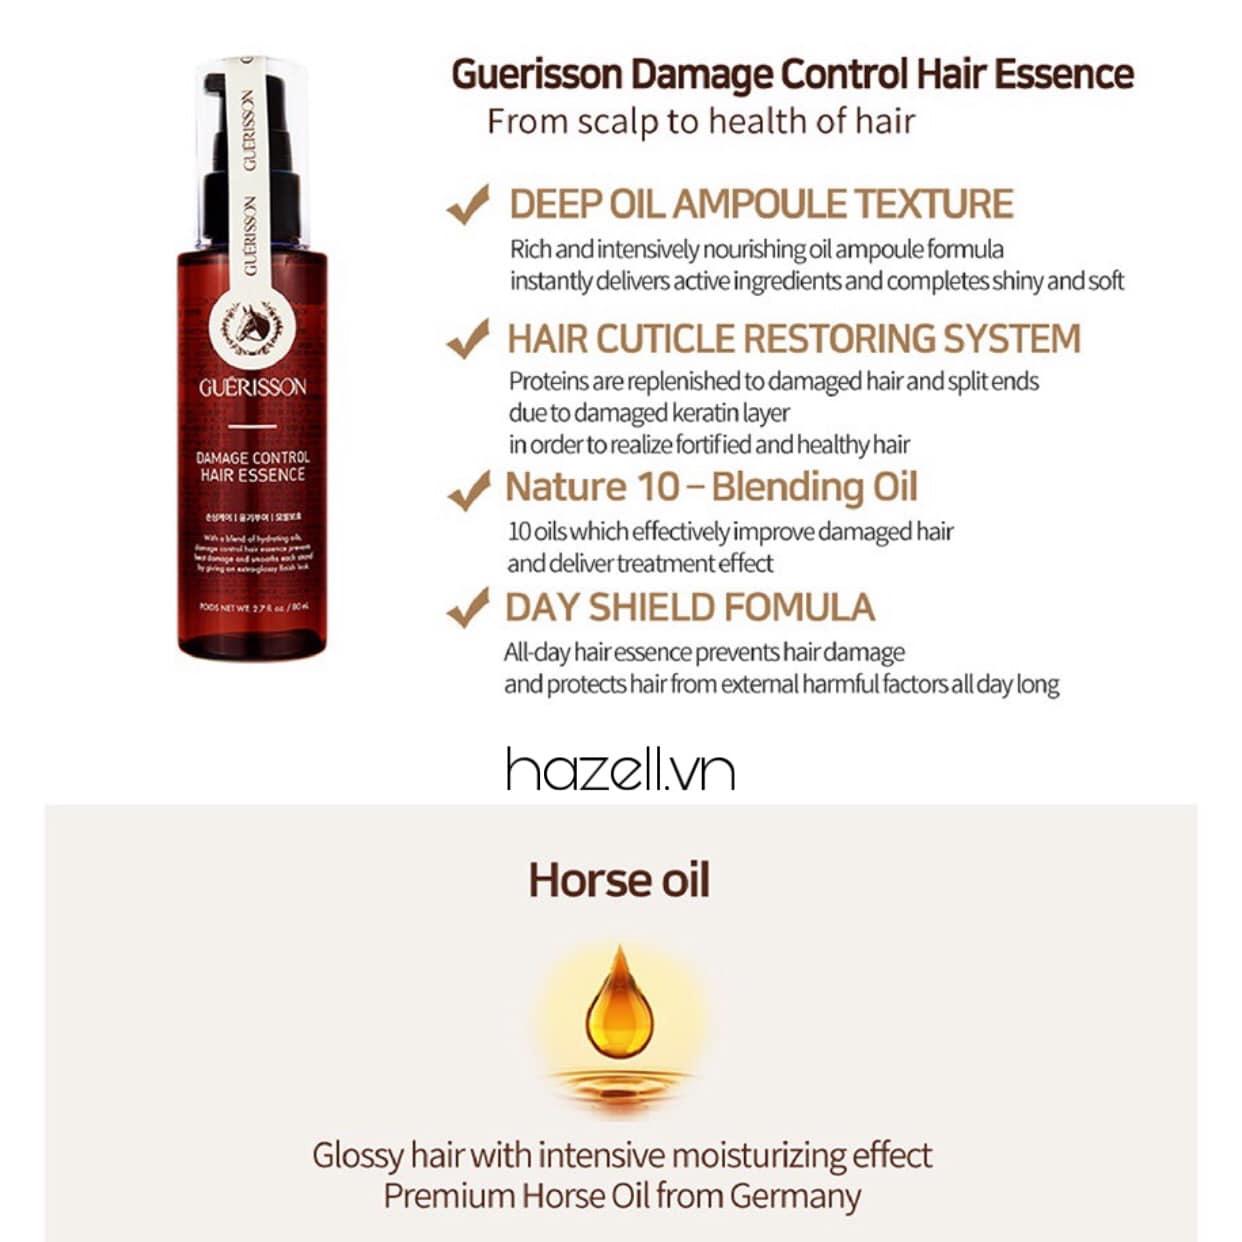 Tinh chất Dưỡng tóc Guerisson Damage Control Hair Essence - 80ml